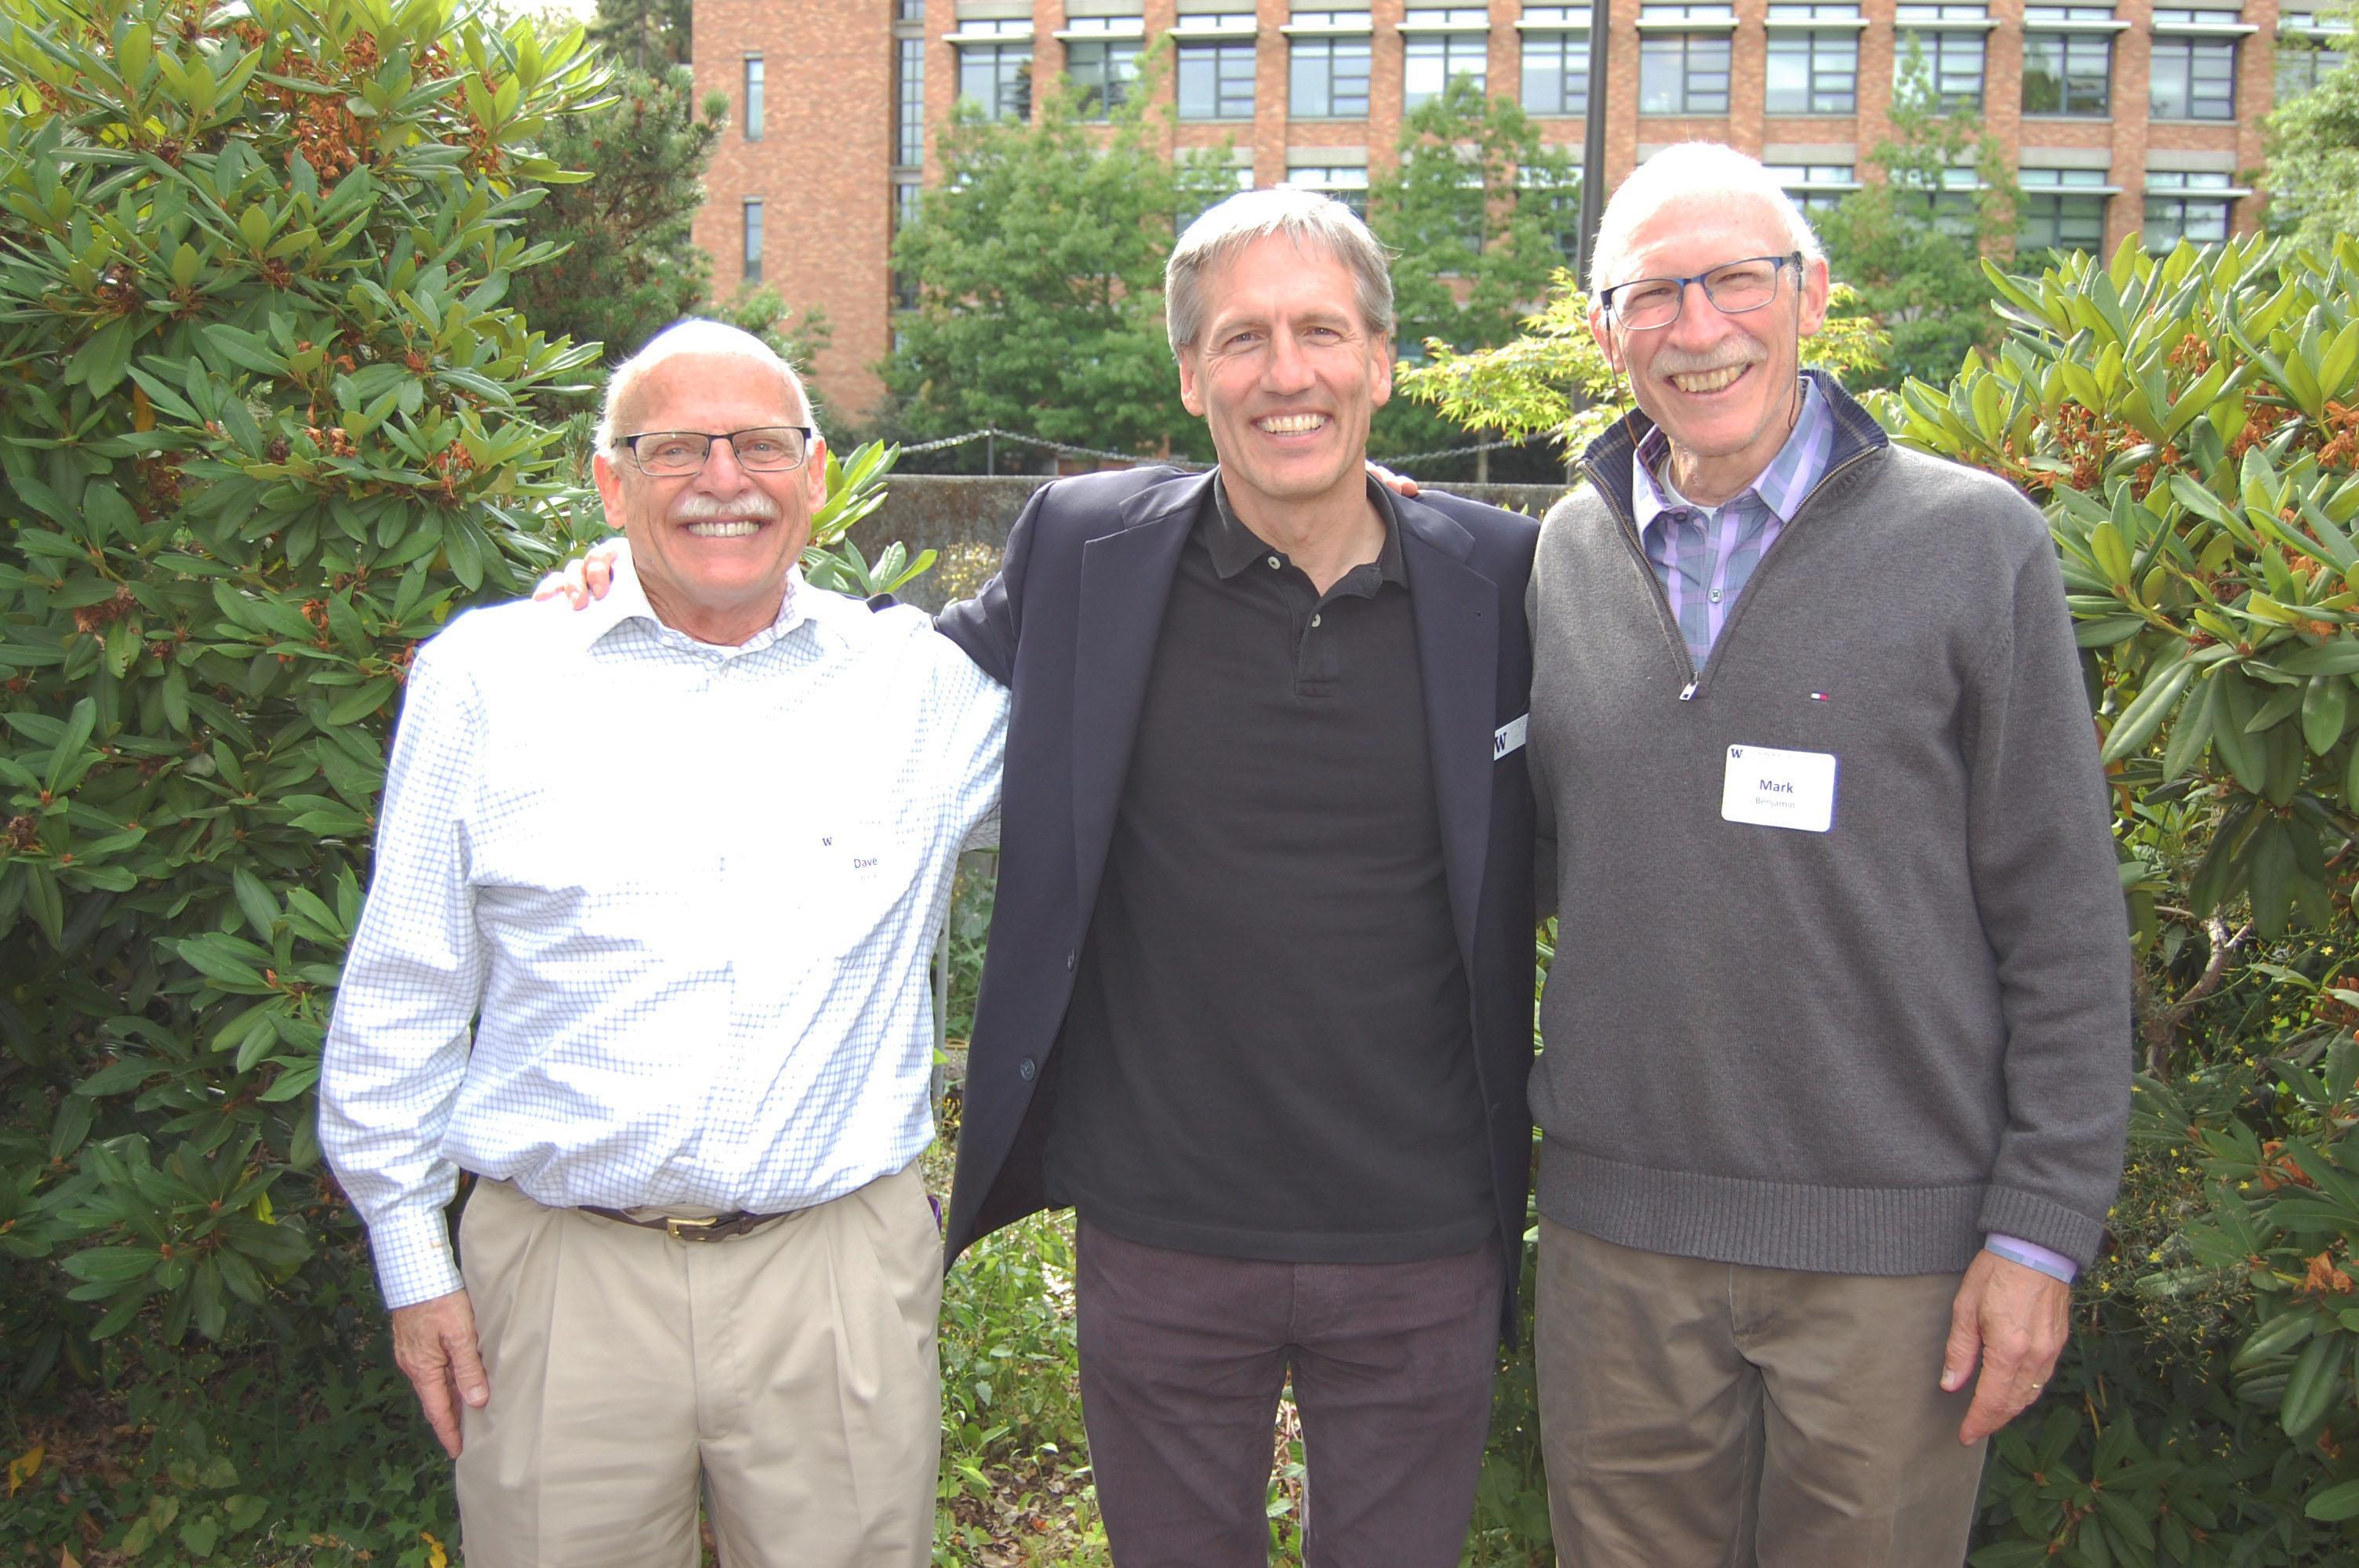 A picture of Professor David Stensel, Department Chair Greg Miller and Professor Mark Benjamin, from left.